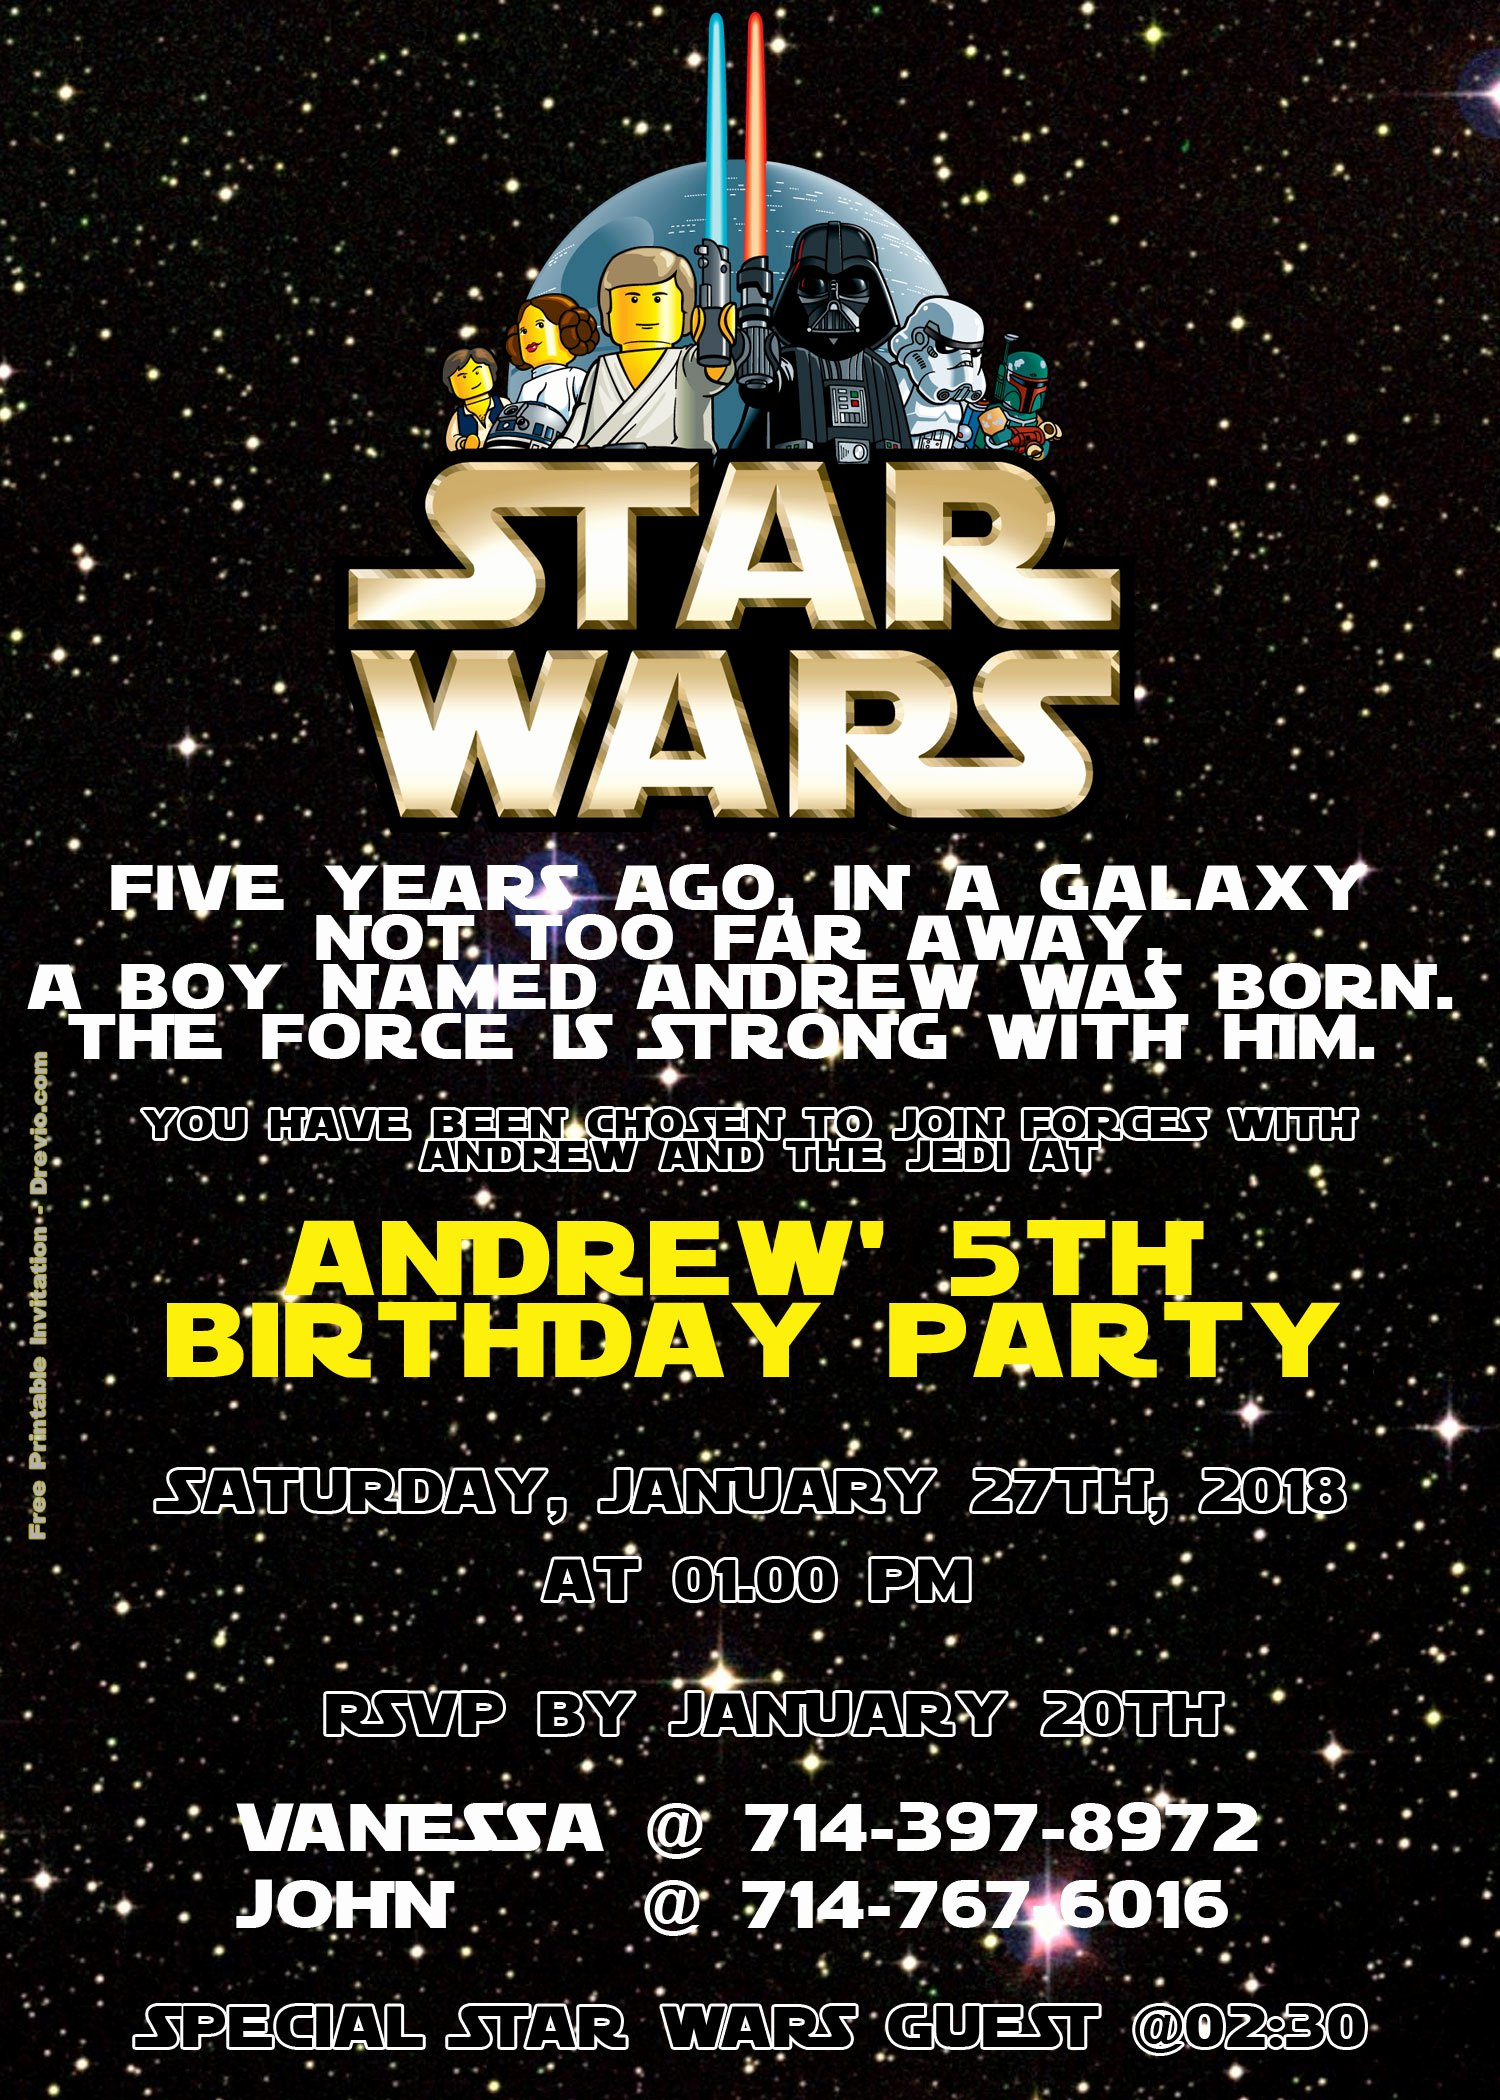 Free Star Wars Party Invitations Beautiful Free Lego Star Wars Birthday Invitation Psd Download